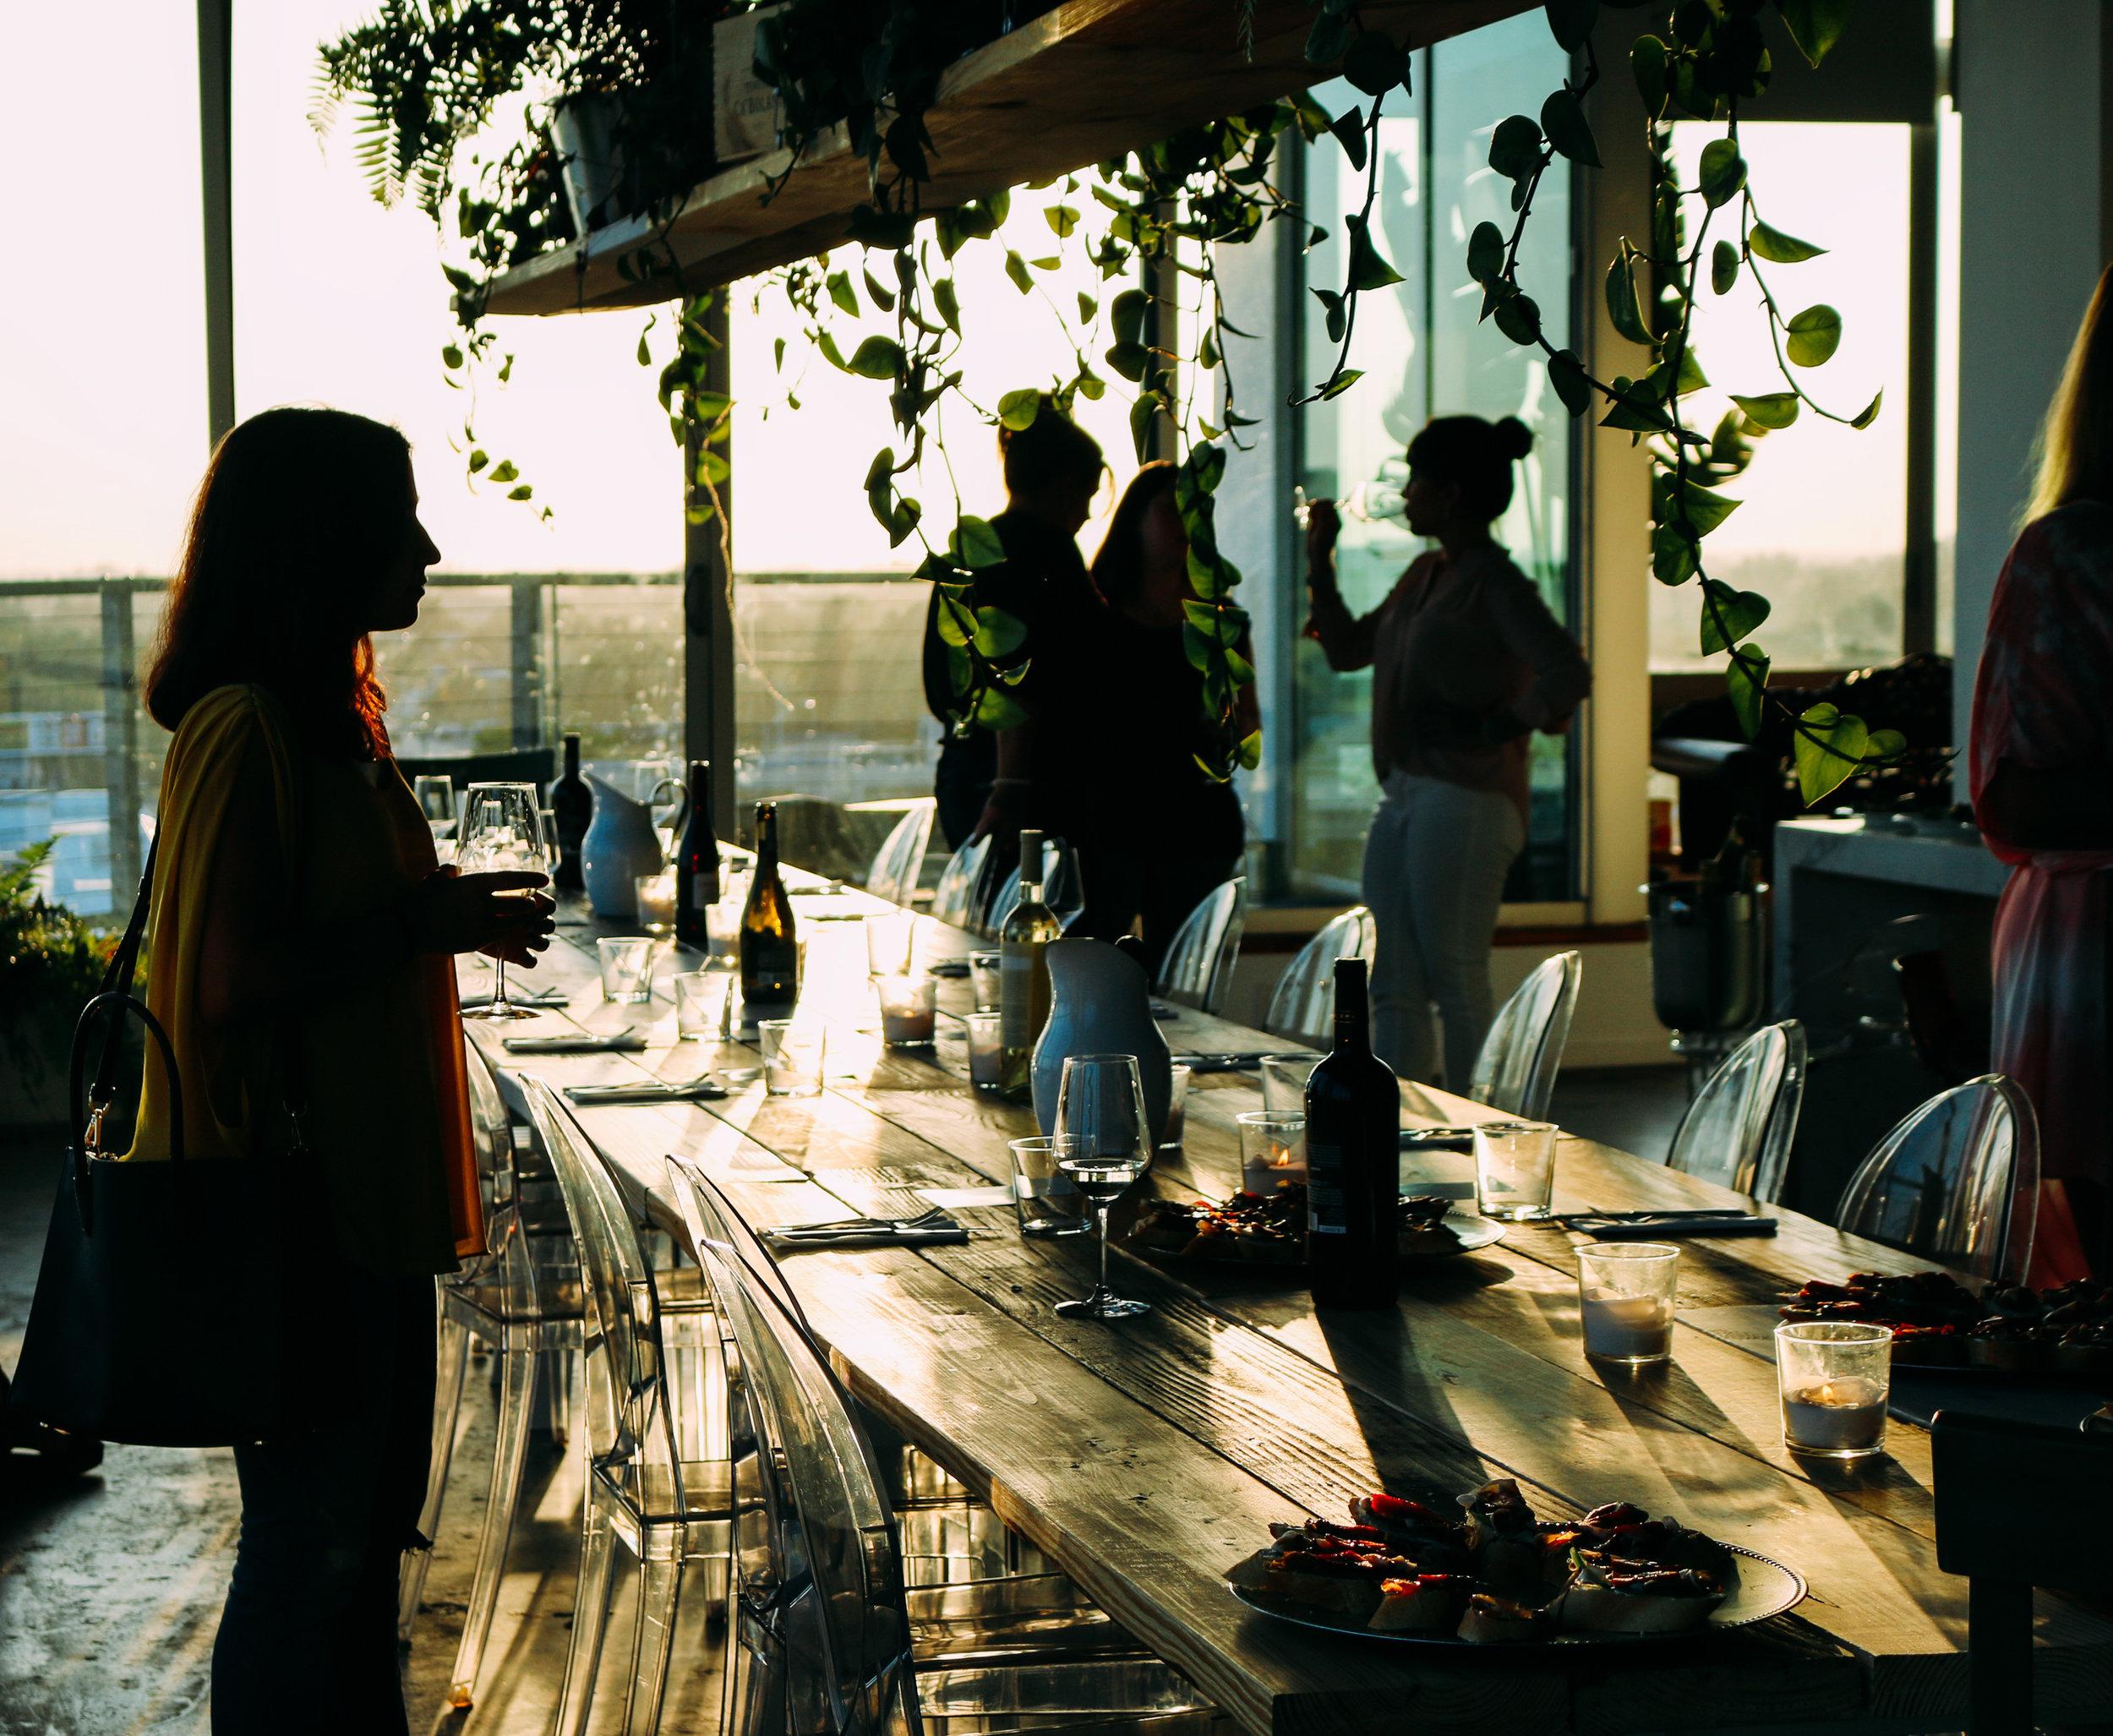 Women Who Wine Uncorked Conversations-Miami Wine Events-Wine Tasting Miami-23.jpg